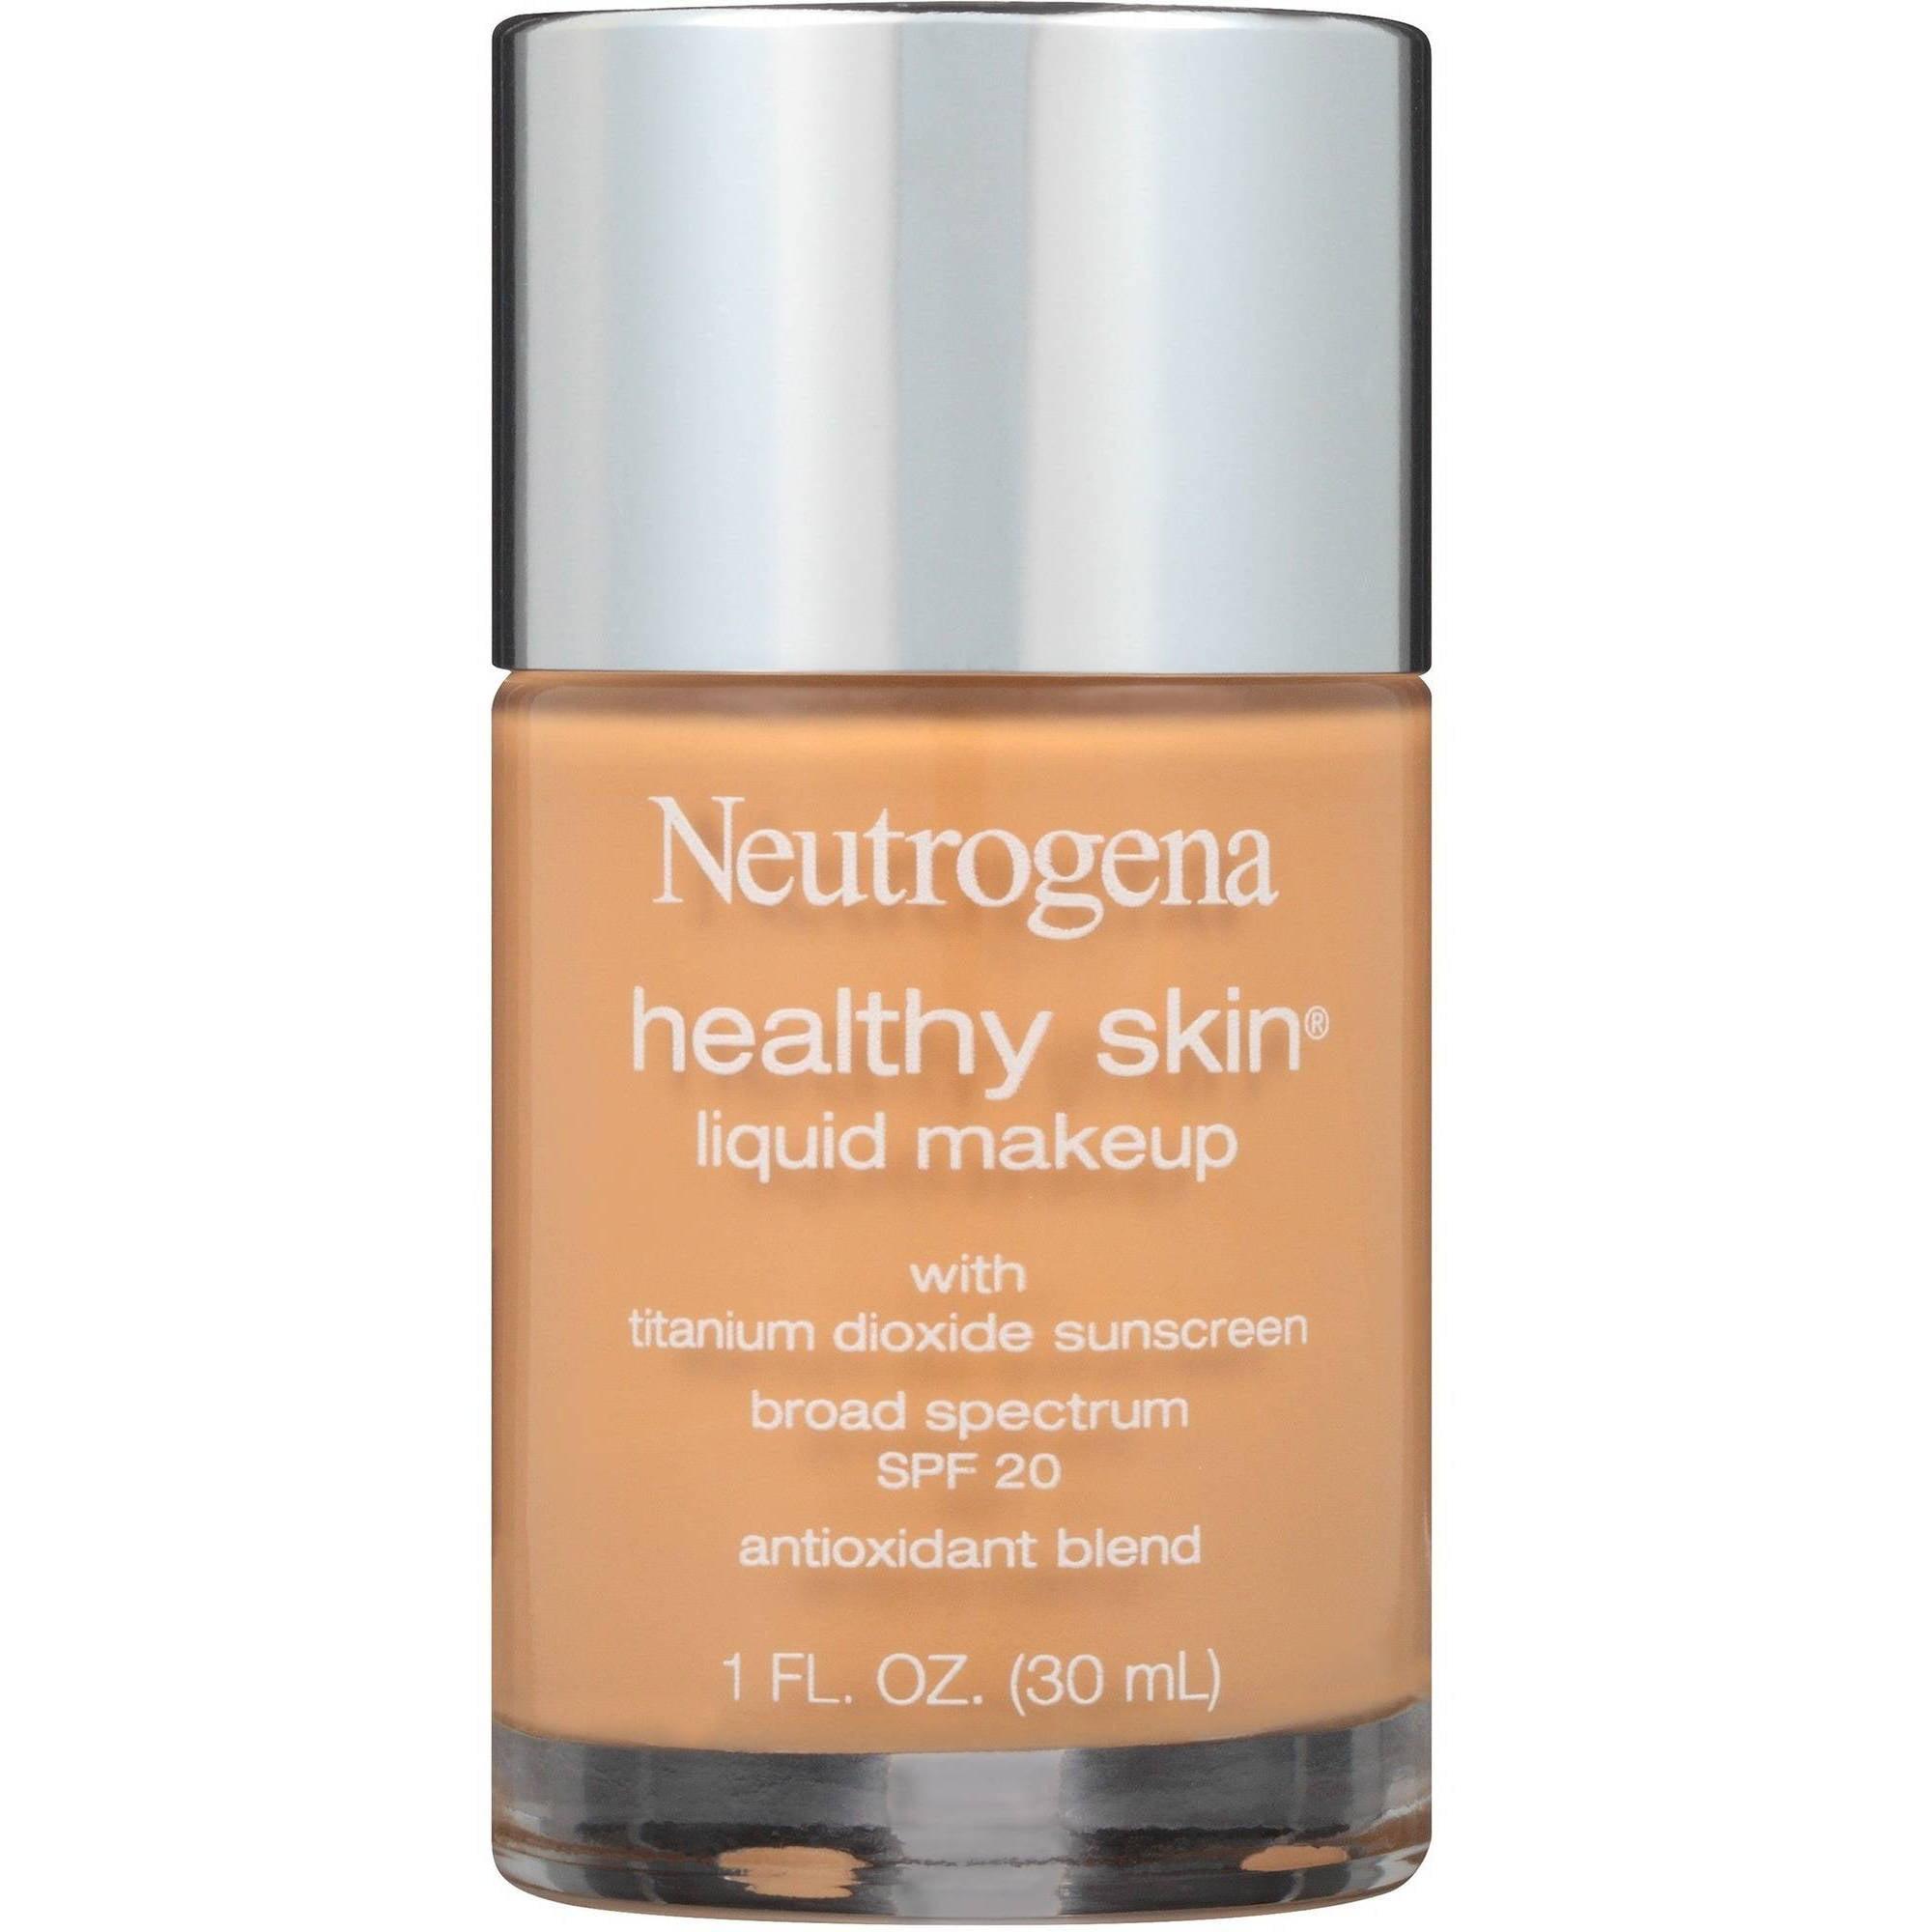 Neutrogena Healthy Skin Liquid Makeup, SPF 20, 85 Honey, 1 fl oz